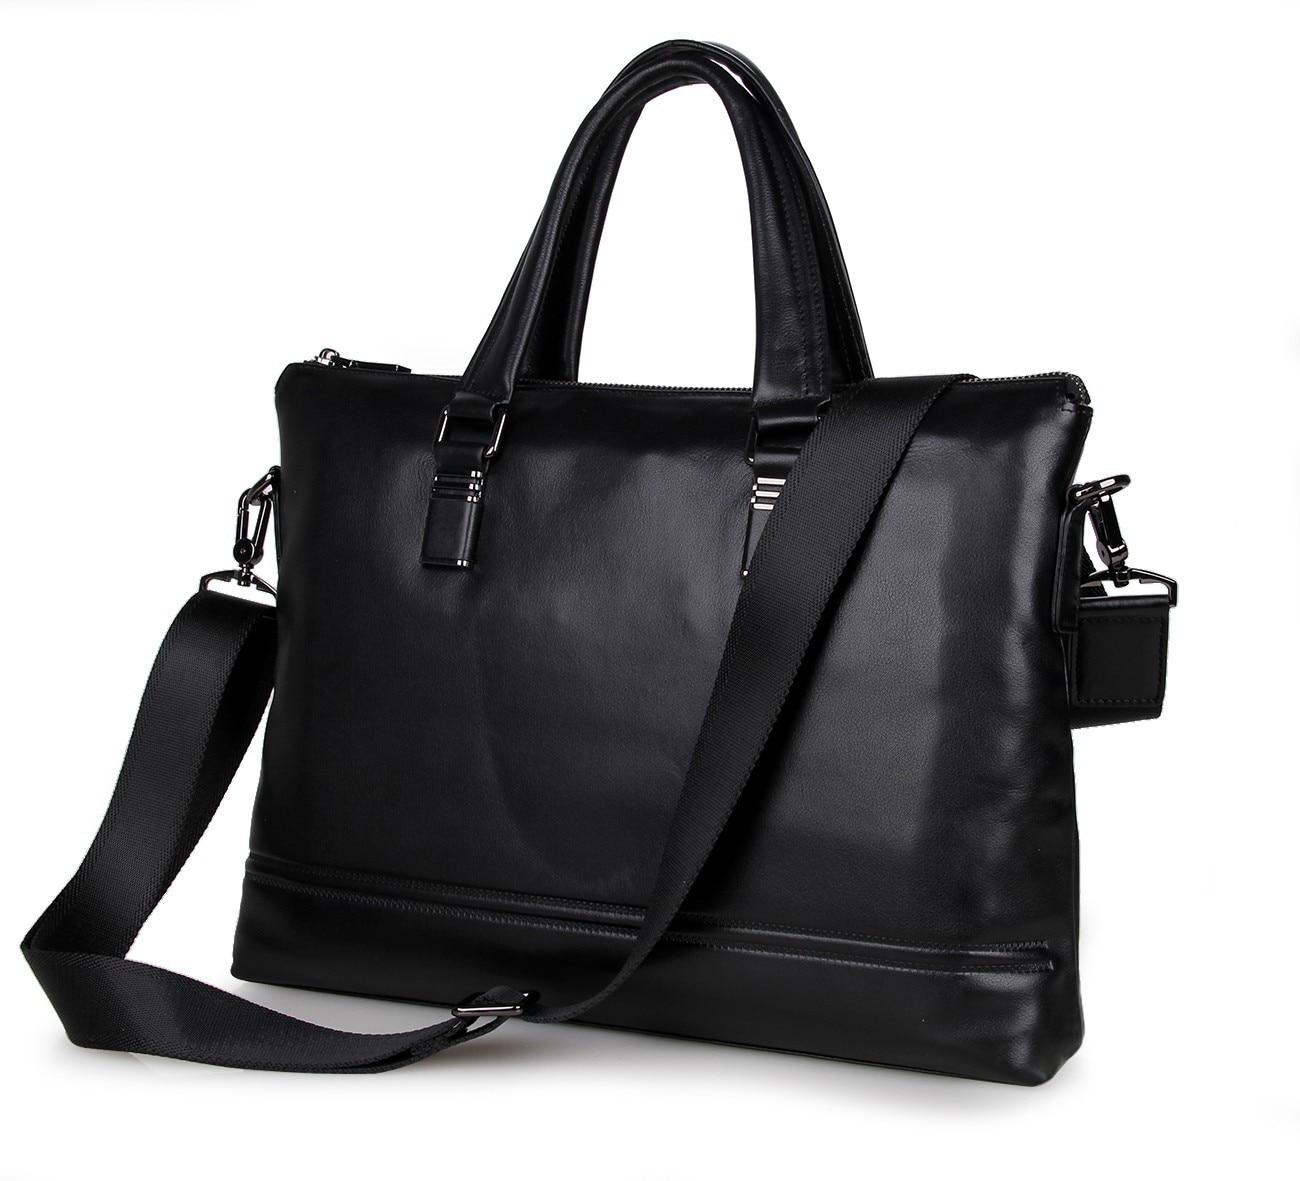 2016 new Genuine leather business bag Men's Slim Briefcase  Laptop high-grade casual men handbags shoulder bags crossbody bag